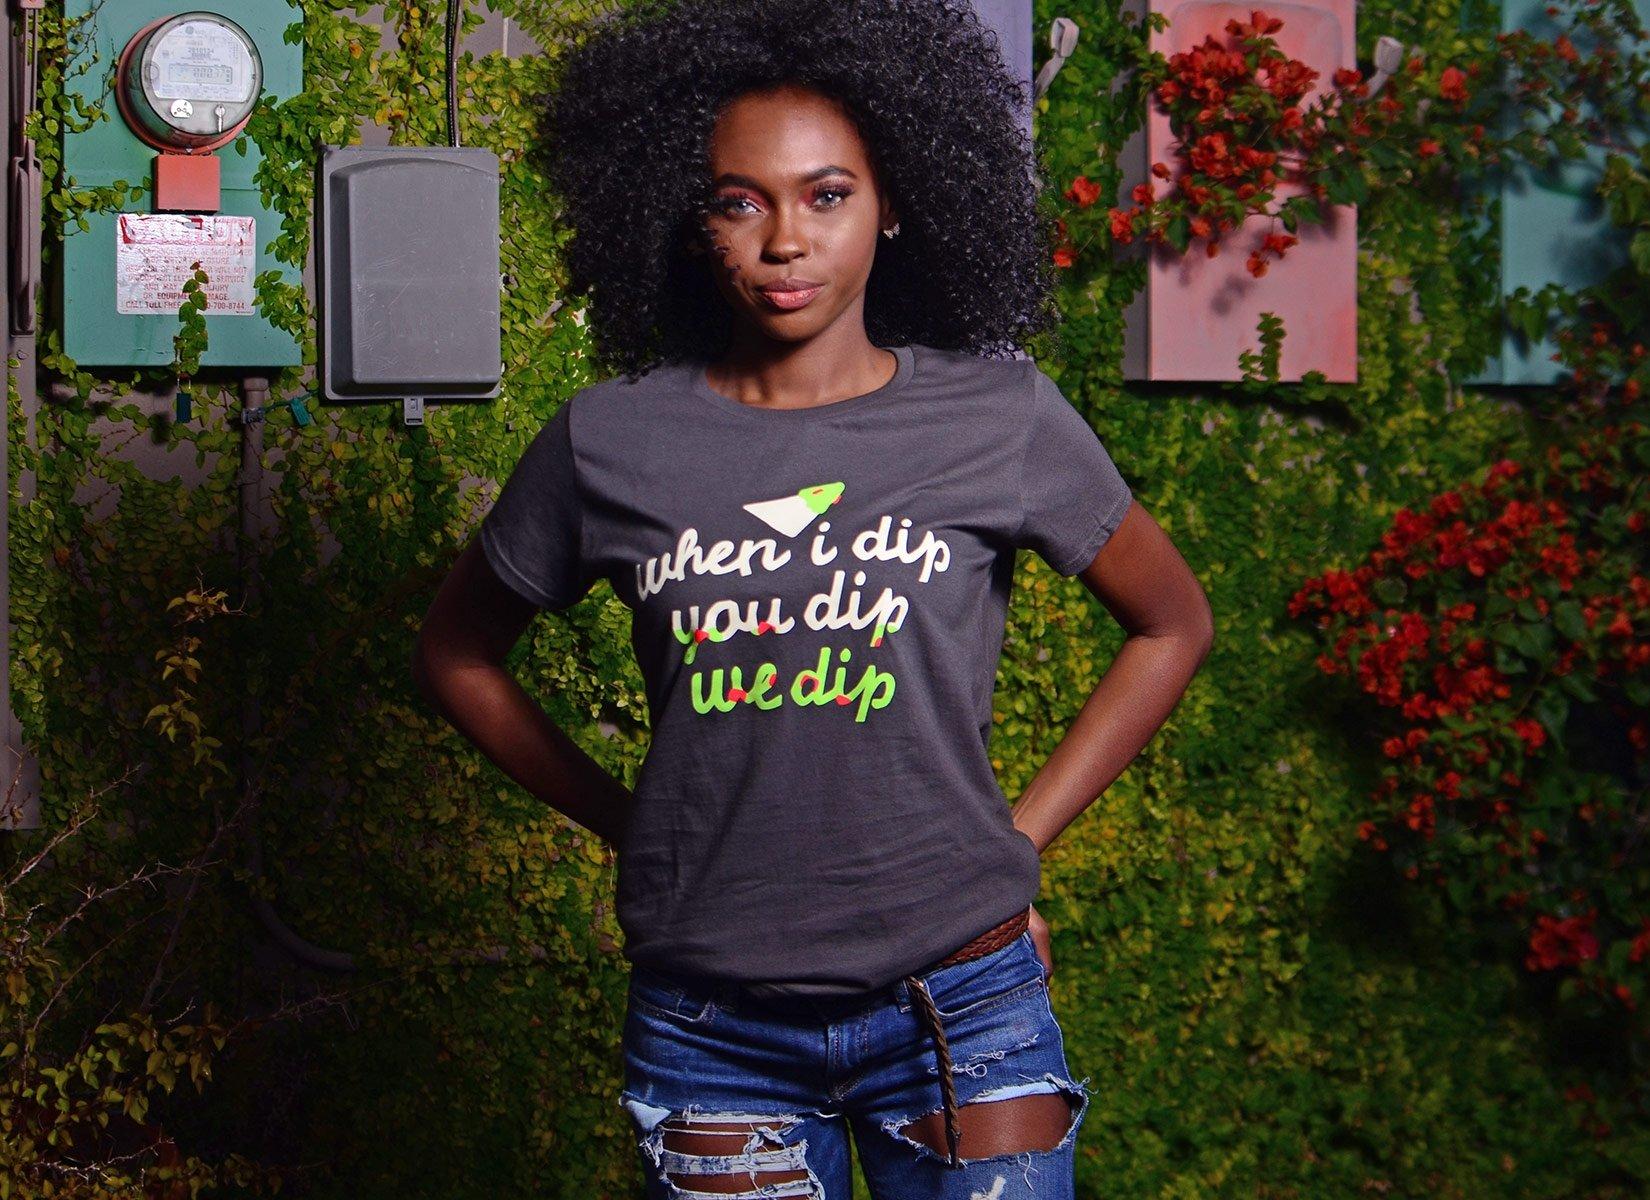 When I Dip You Dip We Dip on Womens T-Shirt